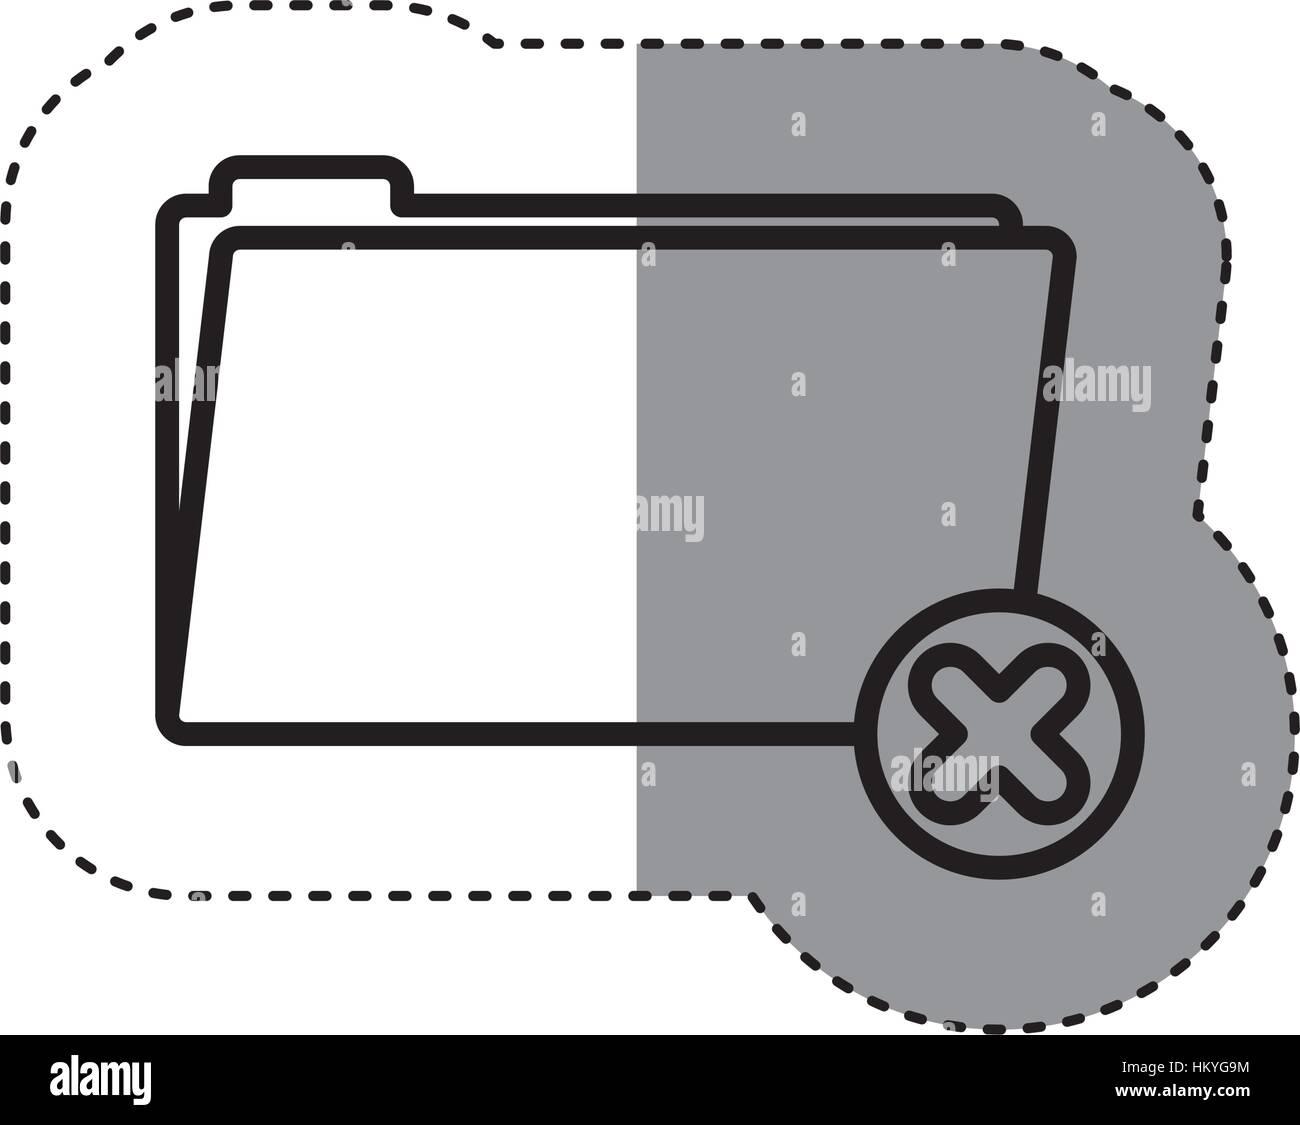 sticker silhouette folder symbol to erased files vector illustration - Stock Vector